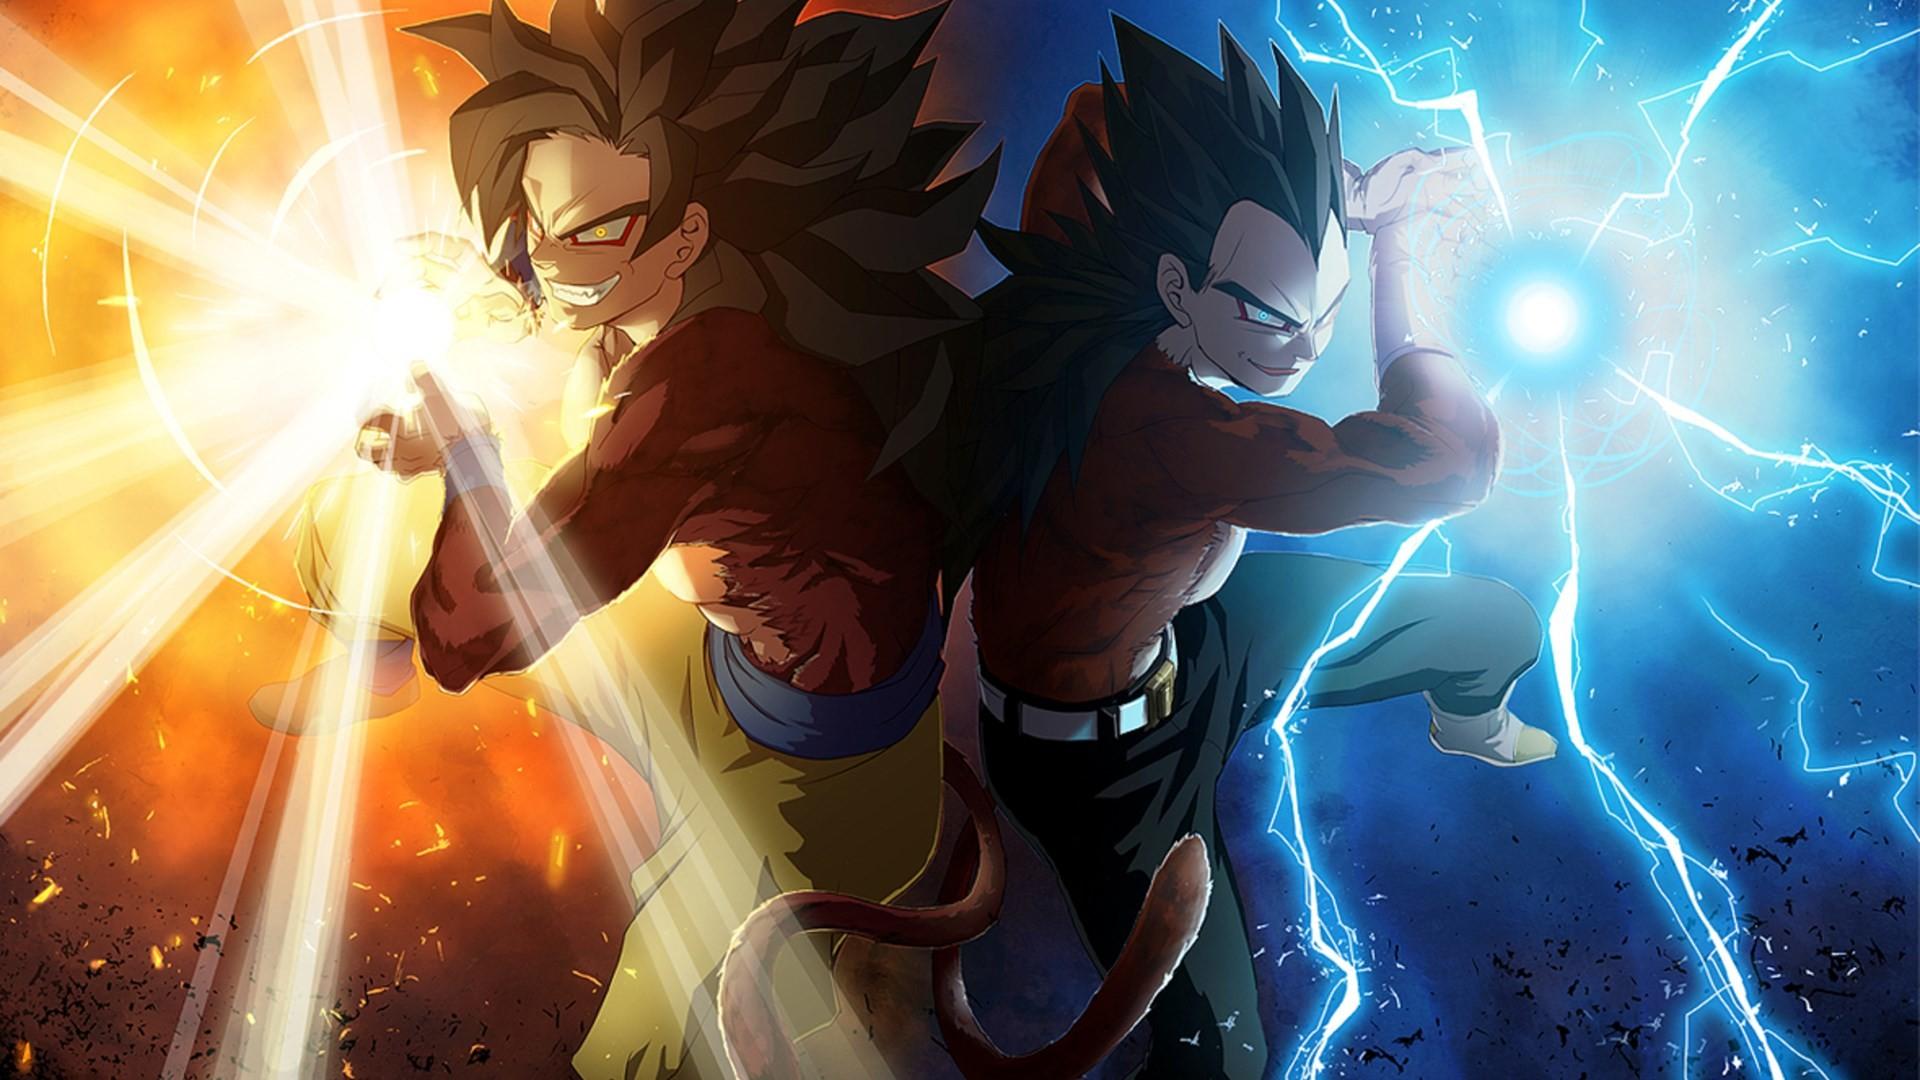 Goku & Vageta* – Dragon Ball Z Wallpaper (35525624) – Fanpop